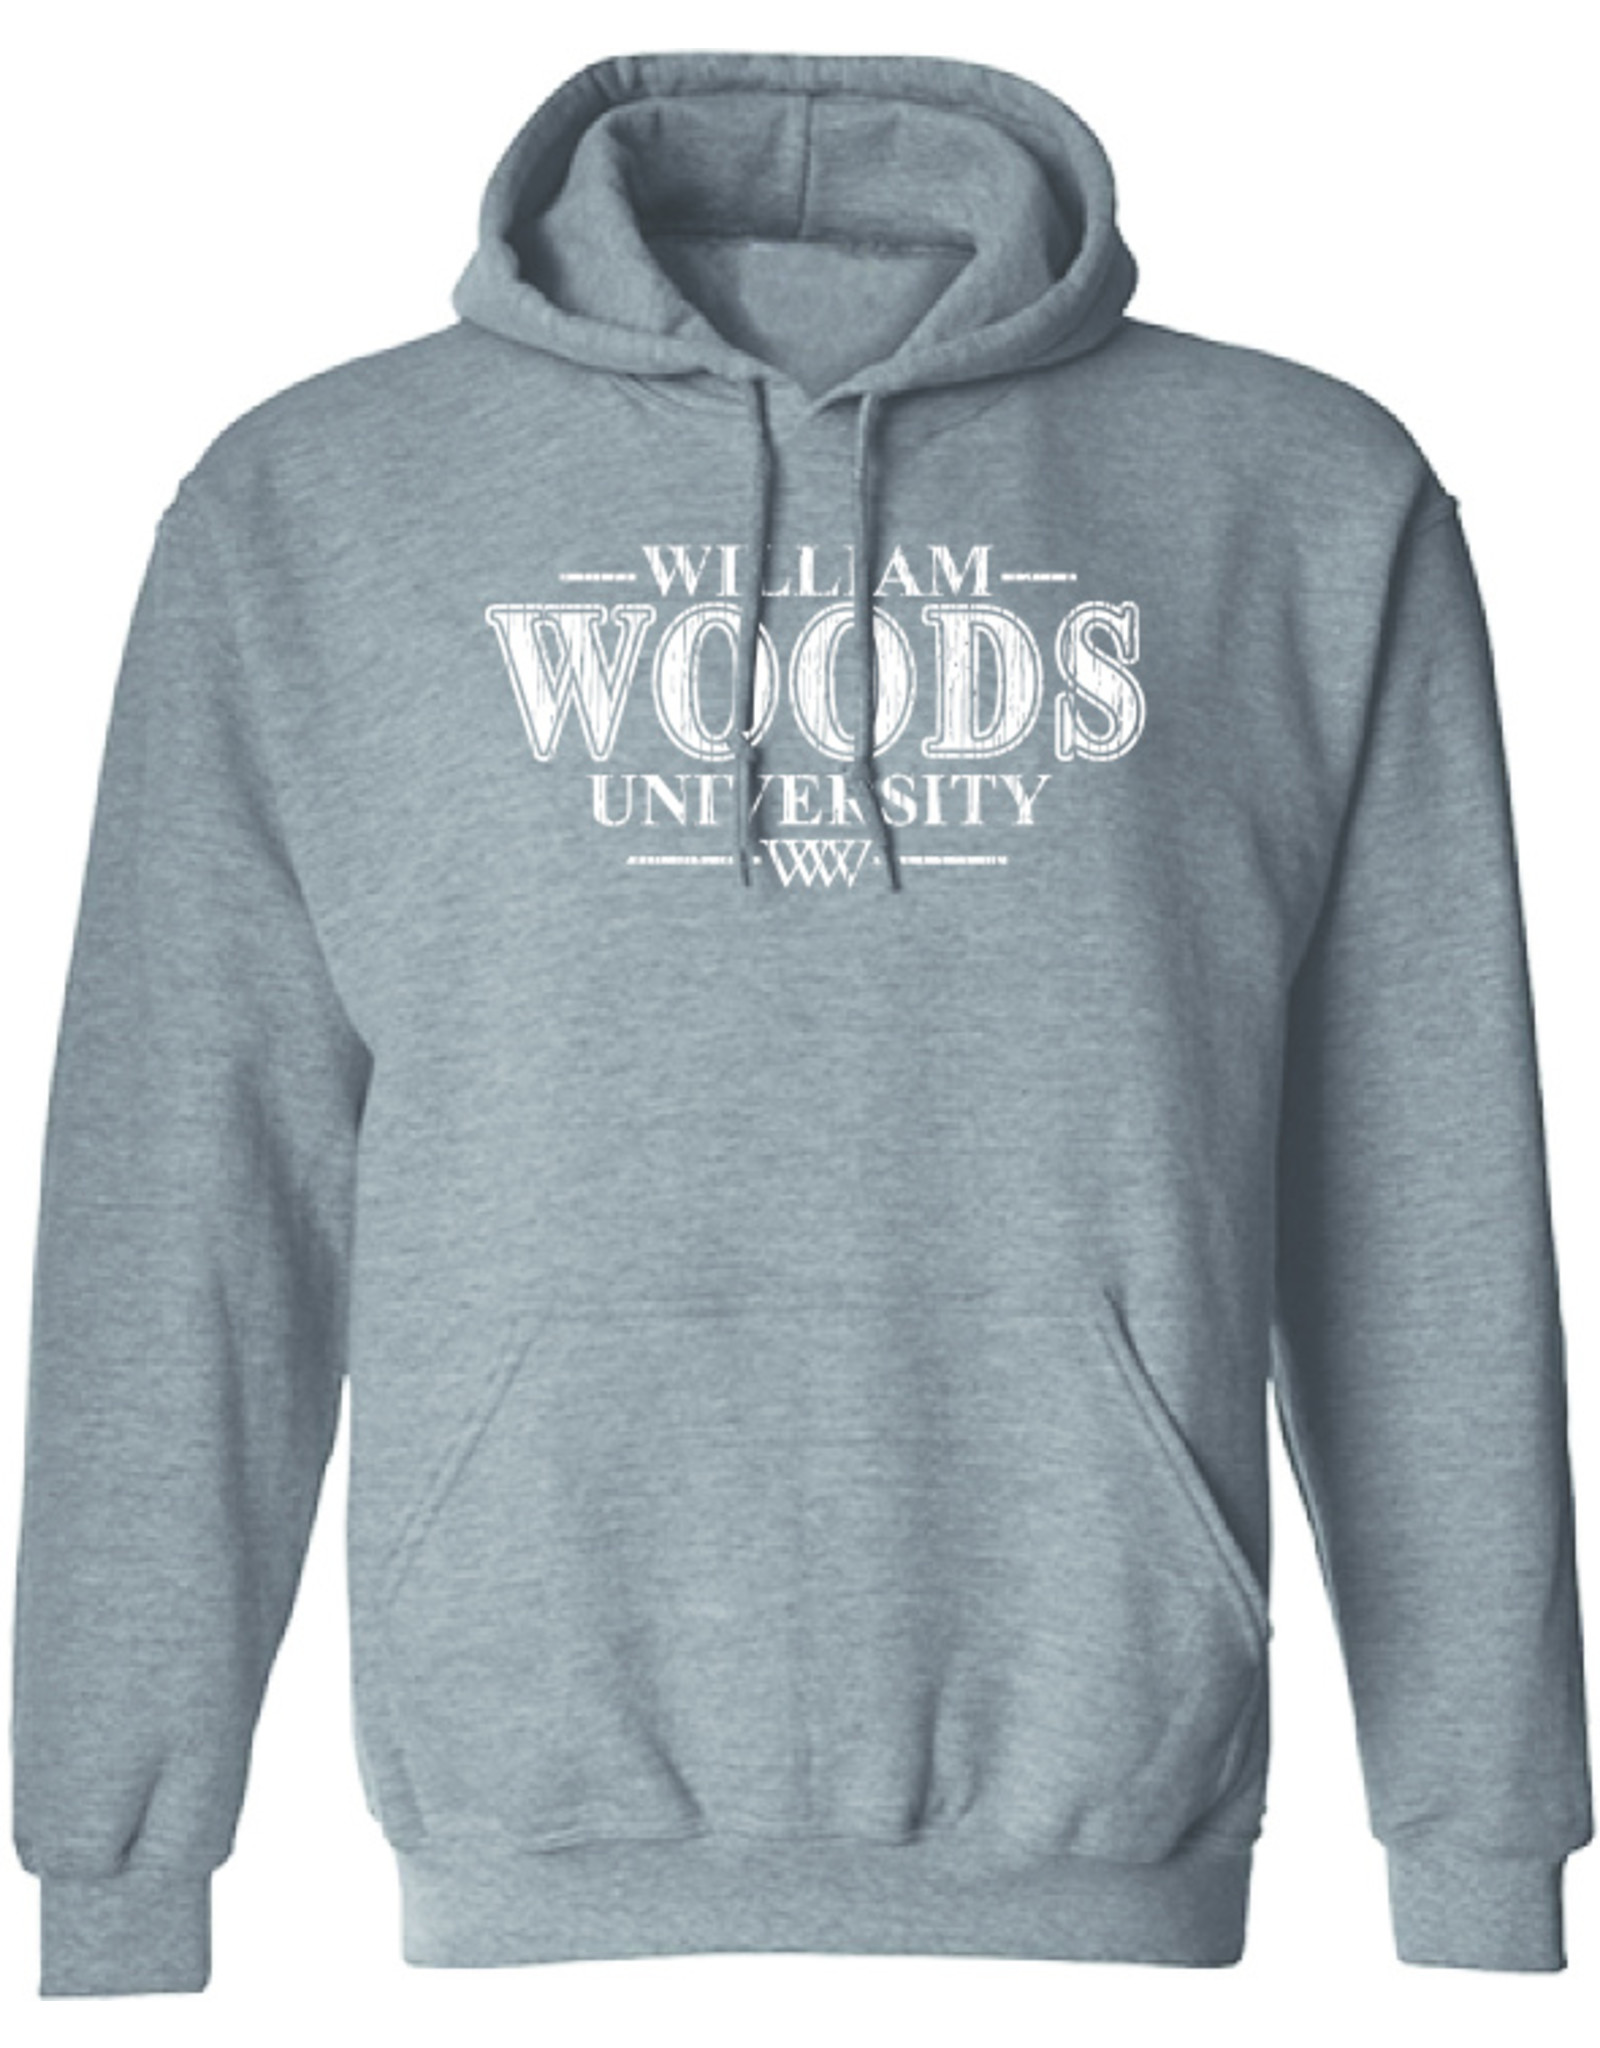 Hoodie william WOODS university